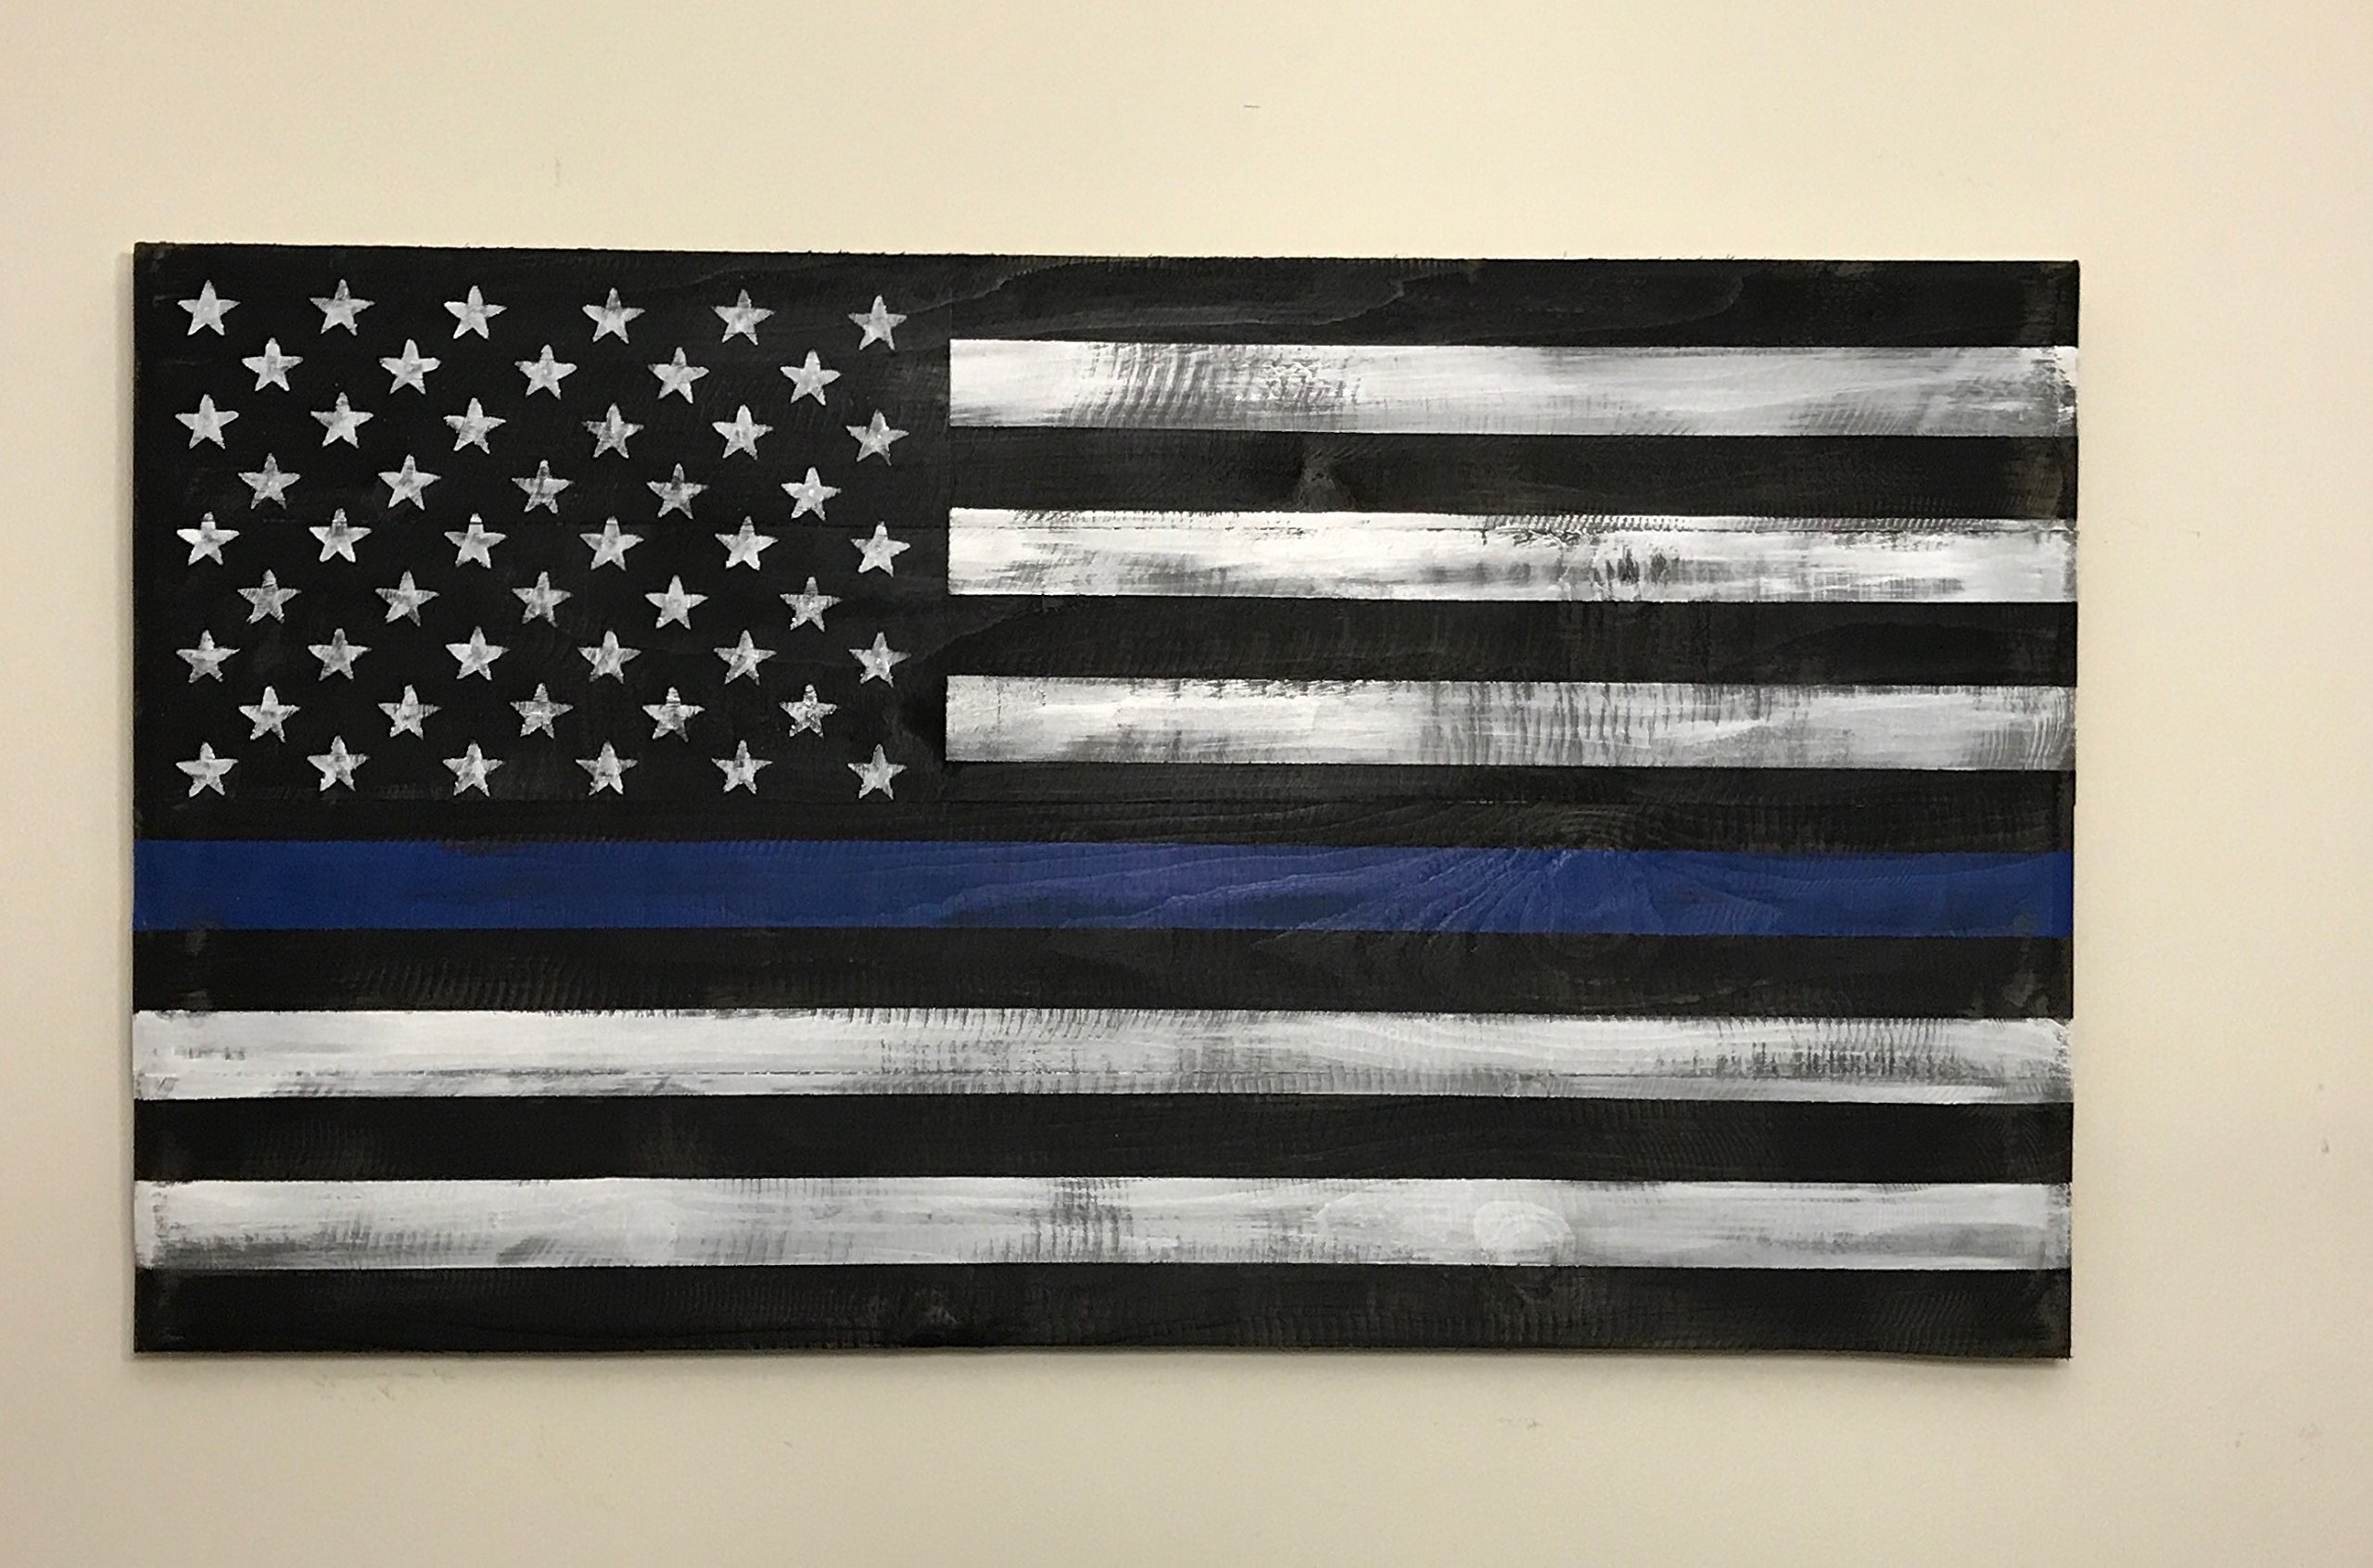 Reclaimed wood Thin Blue Line Flag, Wood Thin Blue Line Flag 22x40'', veteran made. pallet wood flag by Lee Keller Art